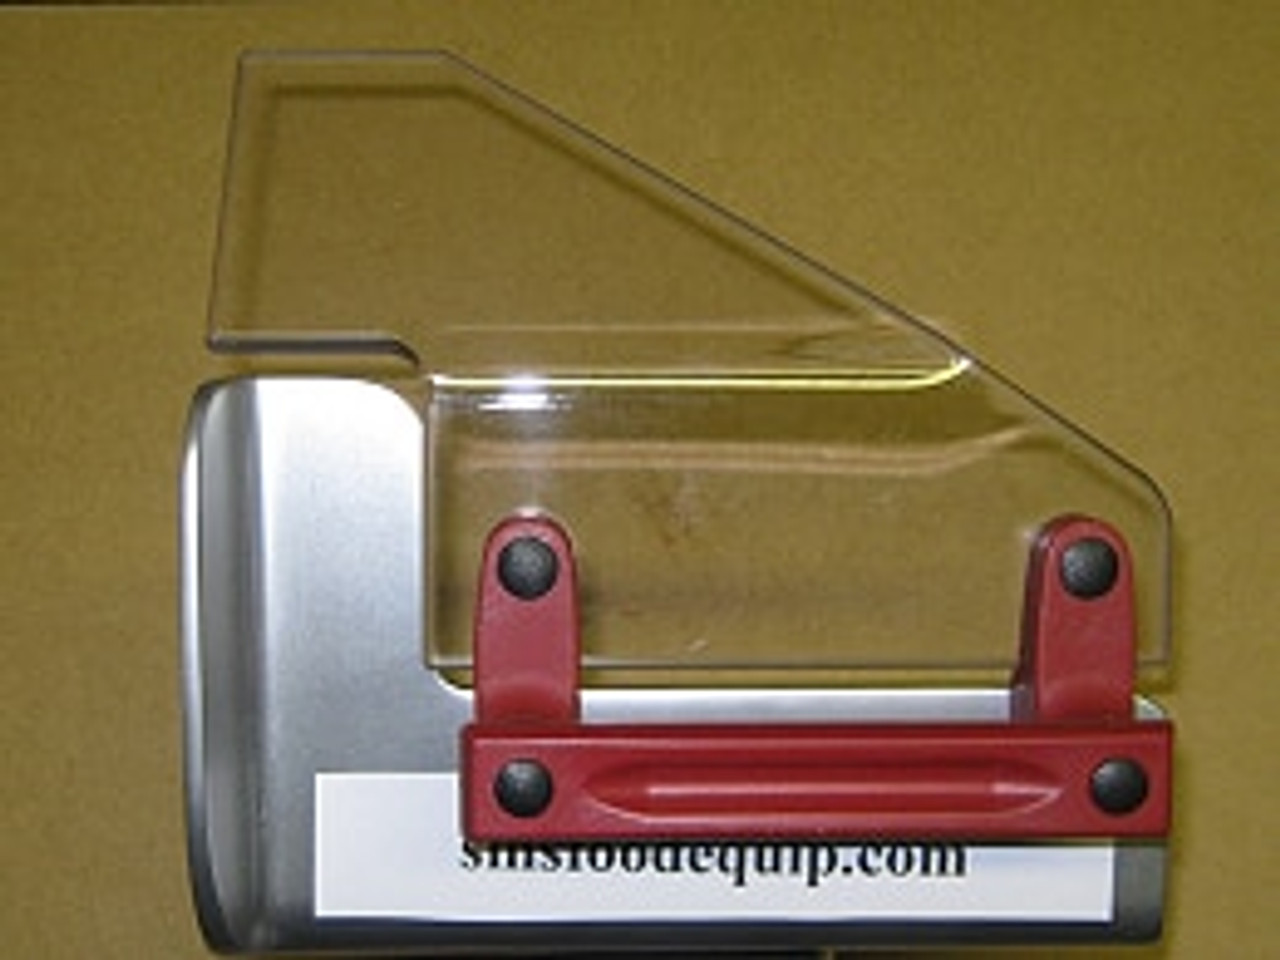 Omas/Berkel RM301CE Slicing Machines Safety Guard